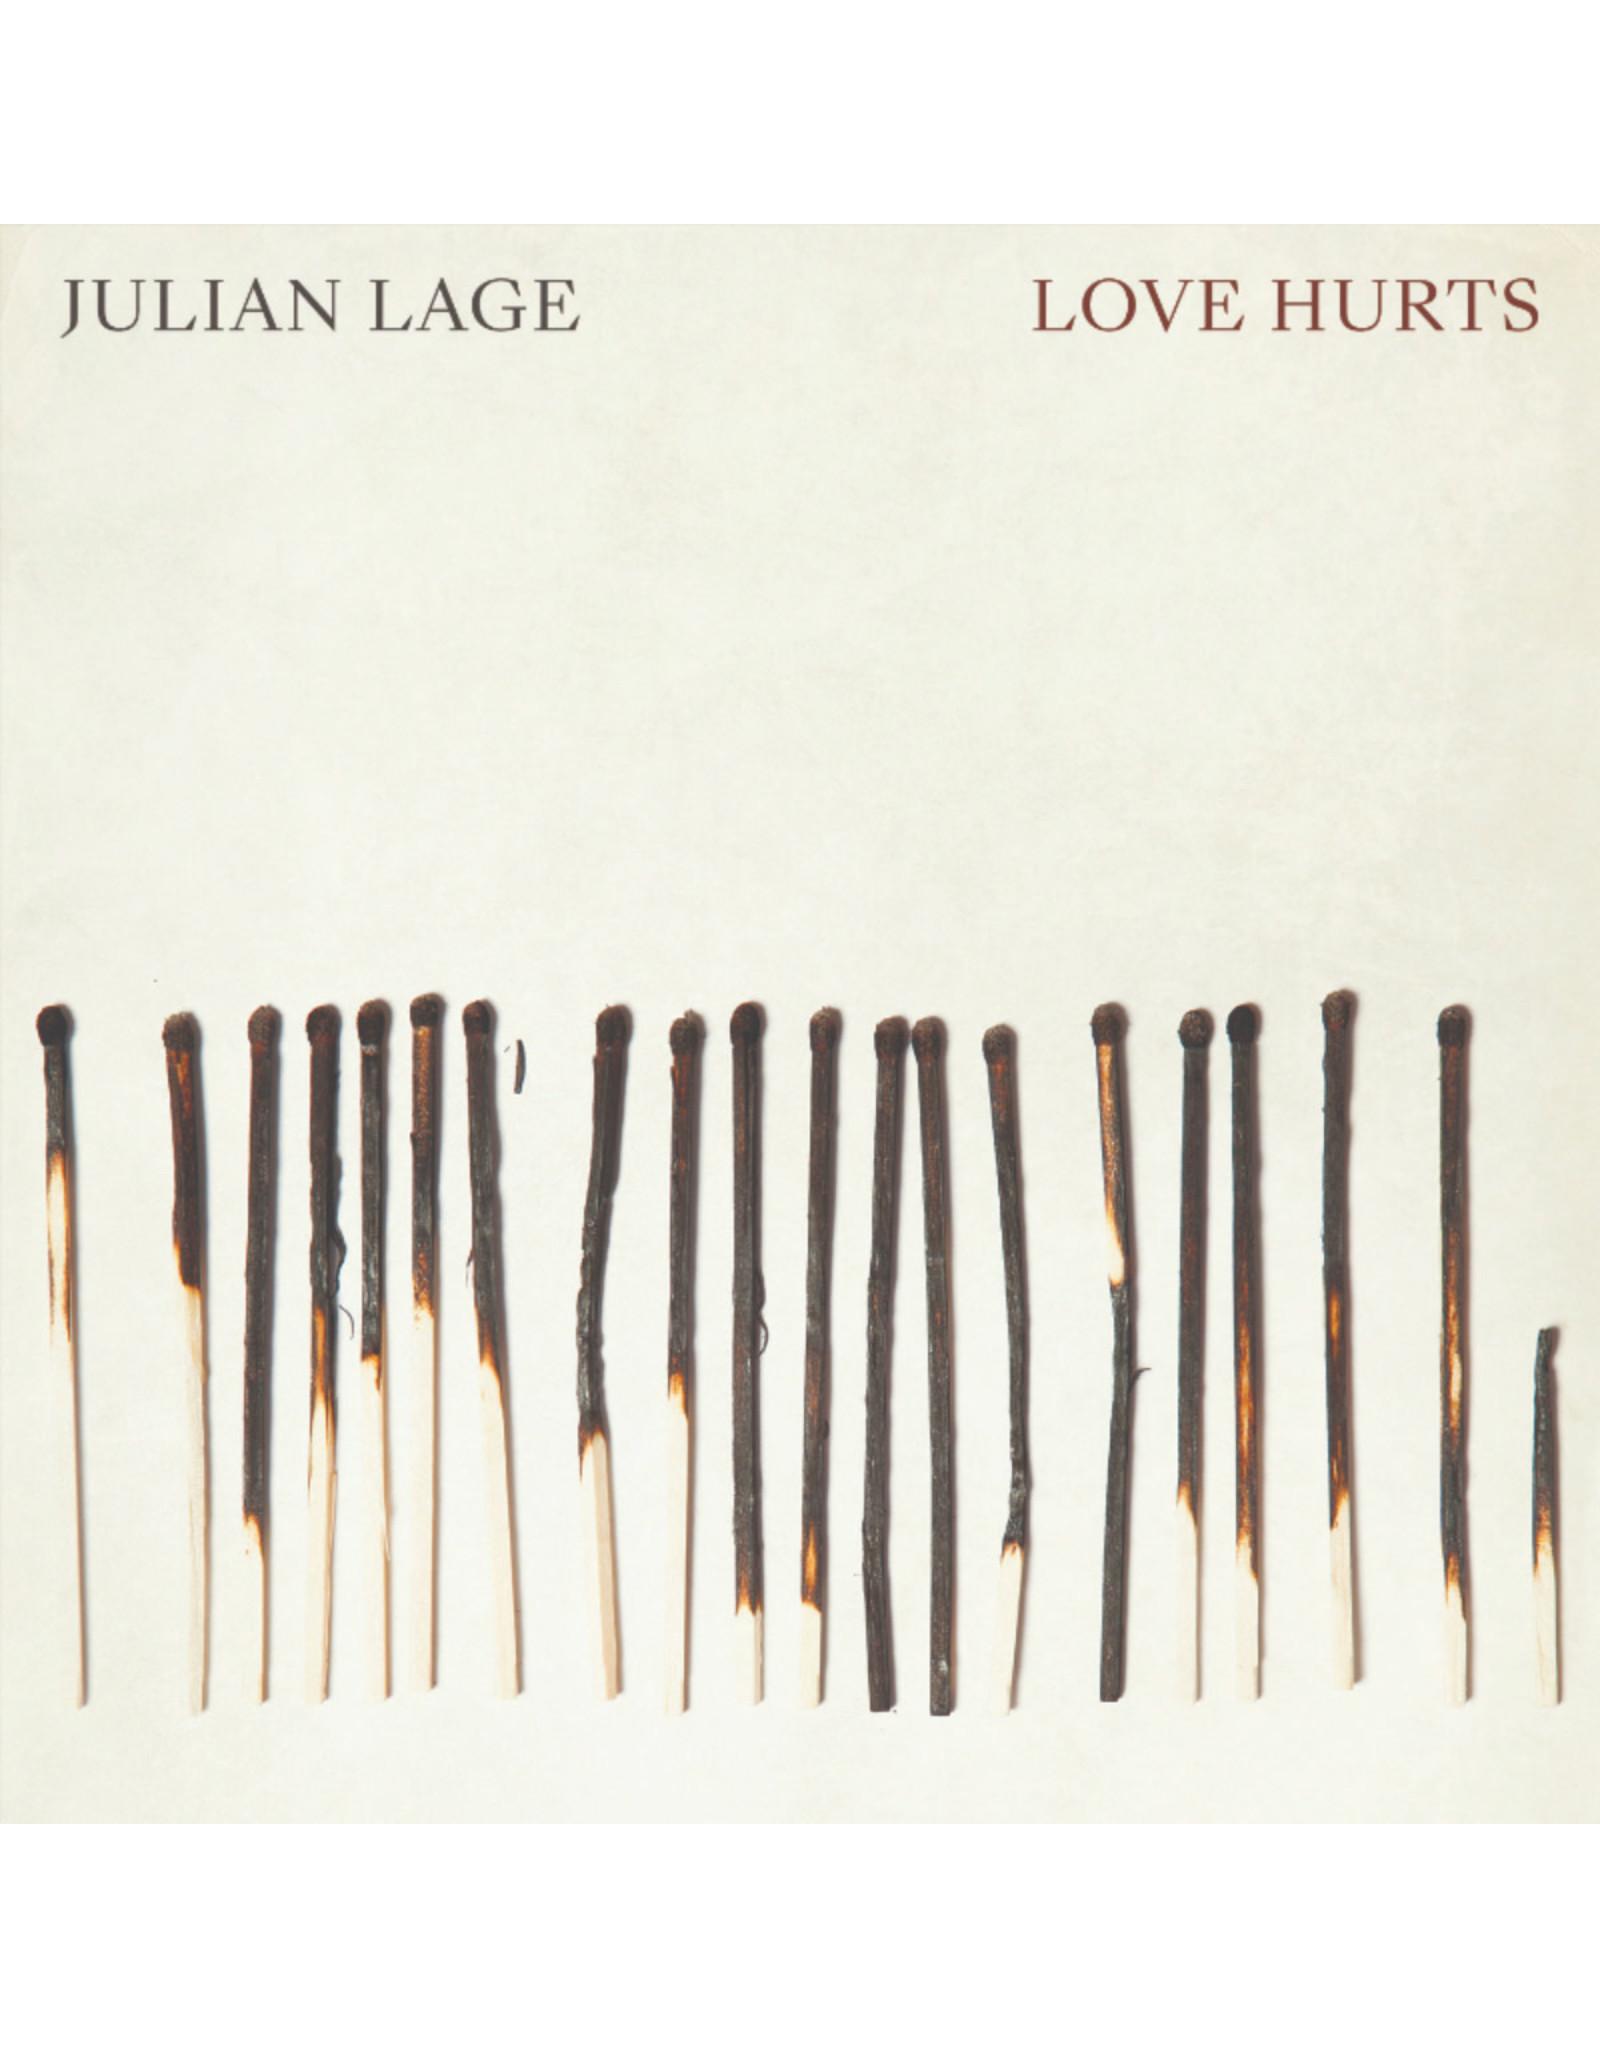 Julian Lage - Love Hurts